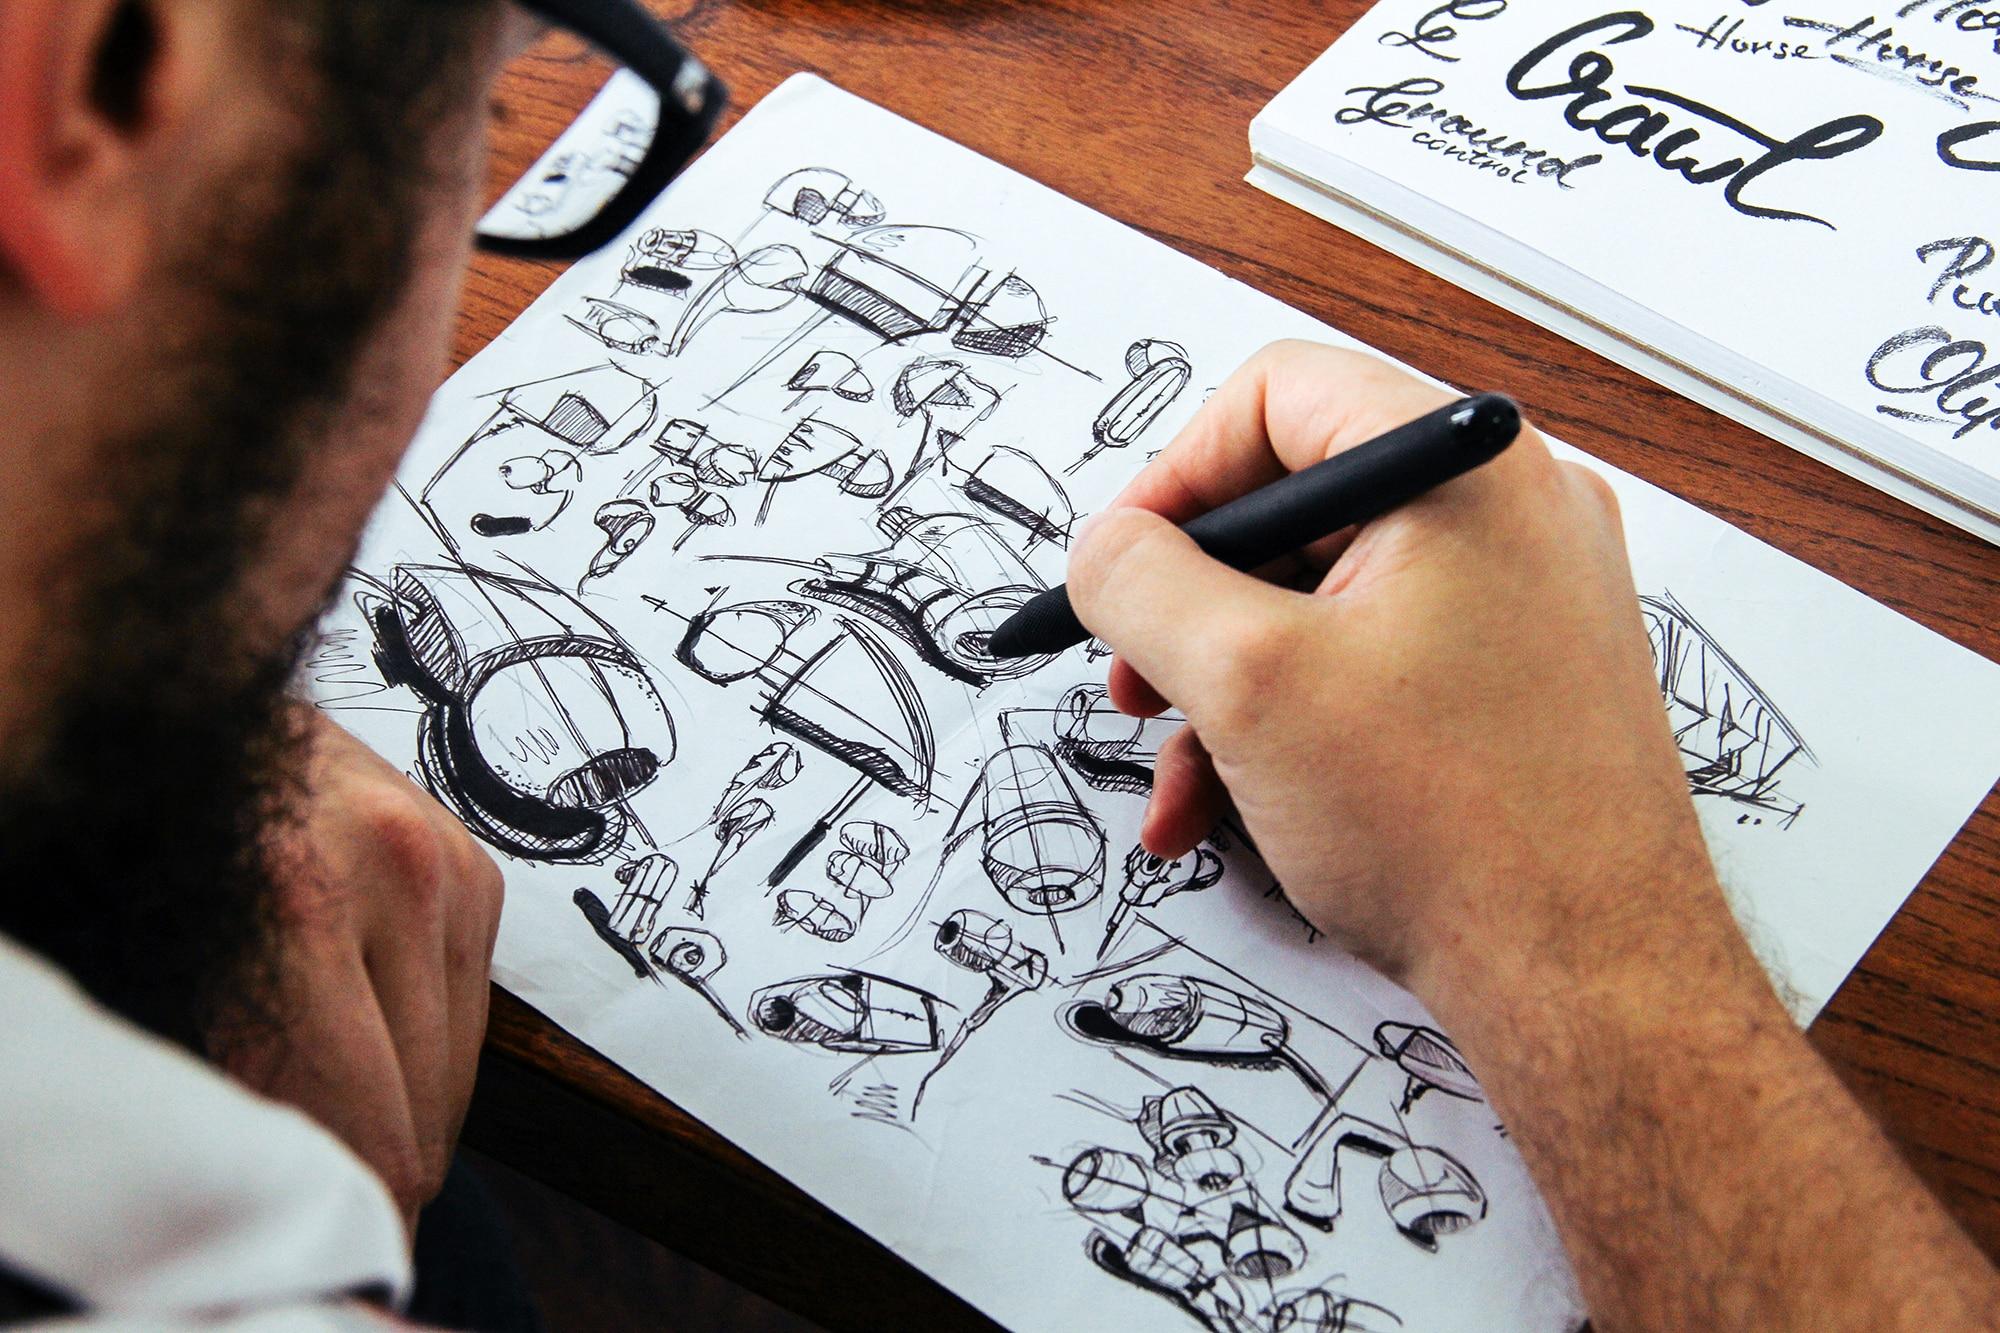 Product Brainstorming Presentations